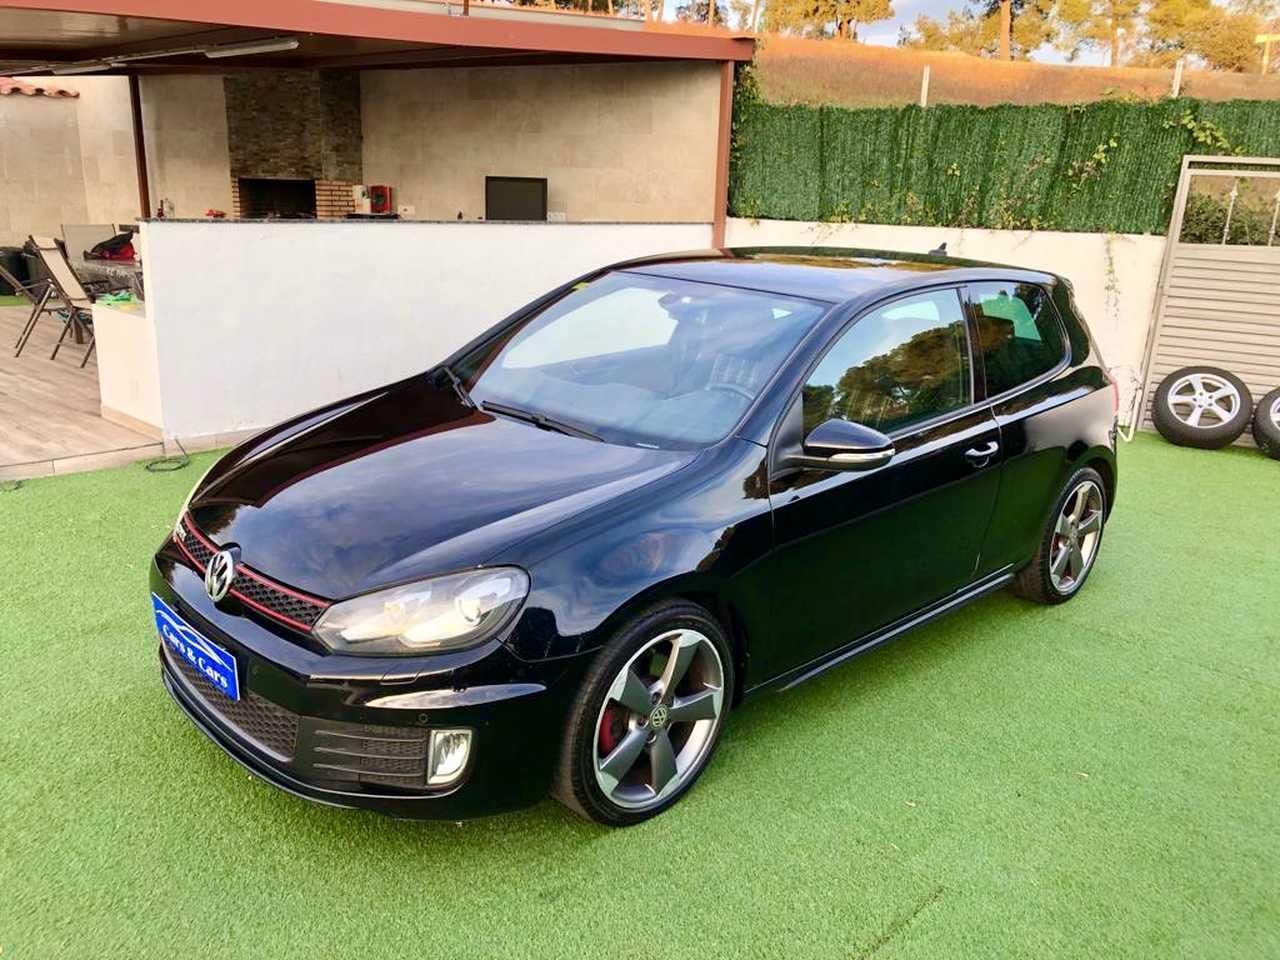 Volkswagen Golf Gti 2.0tfsi 210cv   - Foto 1